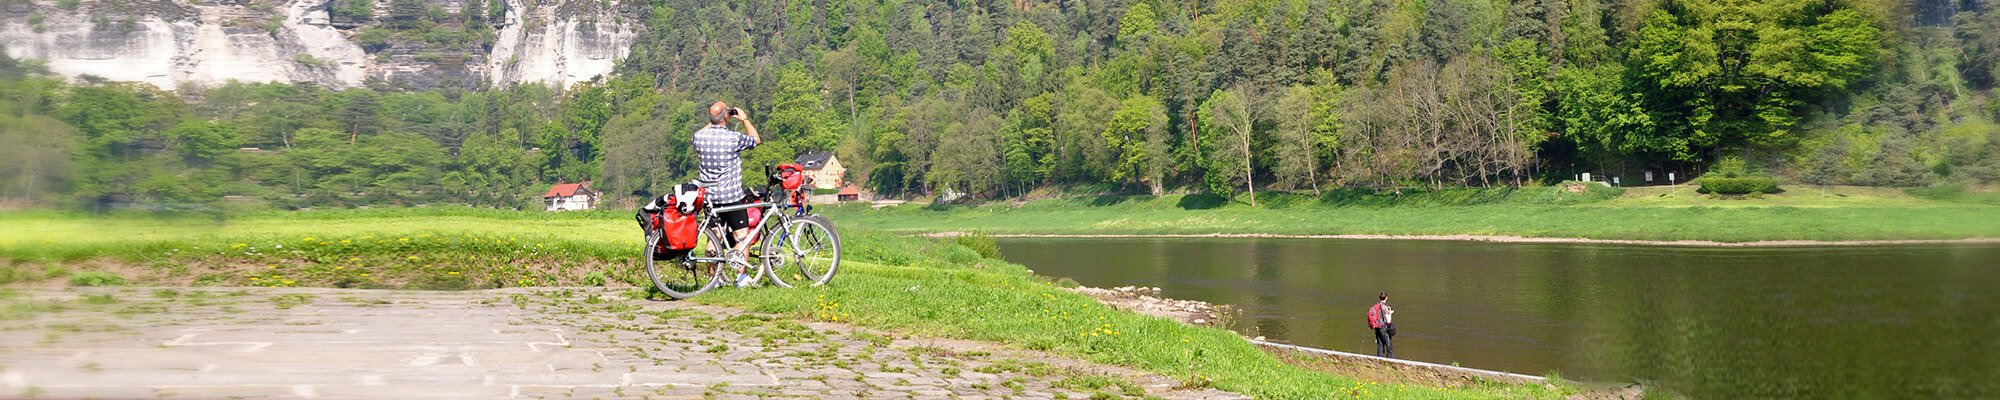 Hotel-Bad-Schandau-Fahrradverleih